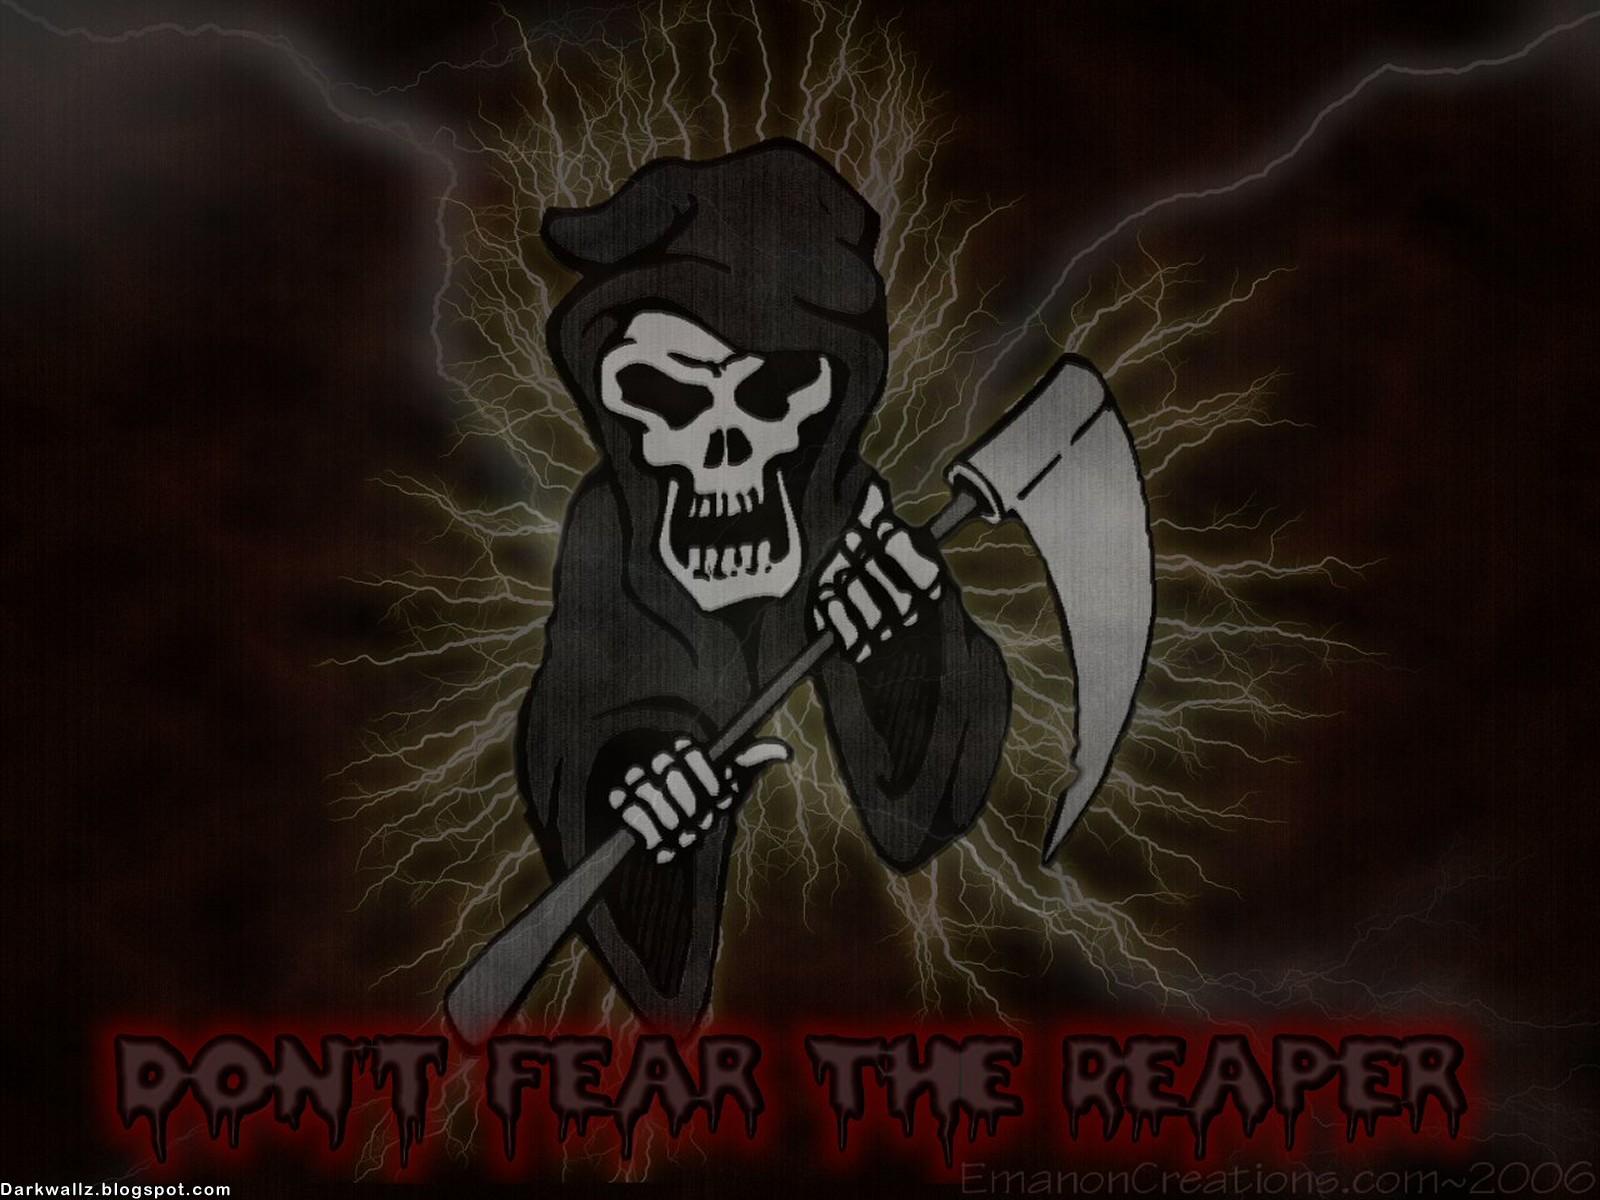 http://2.bp.blogspot.com/_-jo2ZCYhKaY/S62kPSEZ3LI/AAAAAAAAHU8/Joe1MJbsnmc/s1600/Dark_Skulls_Wallpapers_98%2B(darkwallz.blogspot.com).jpg